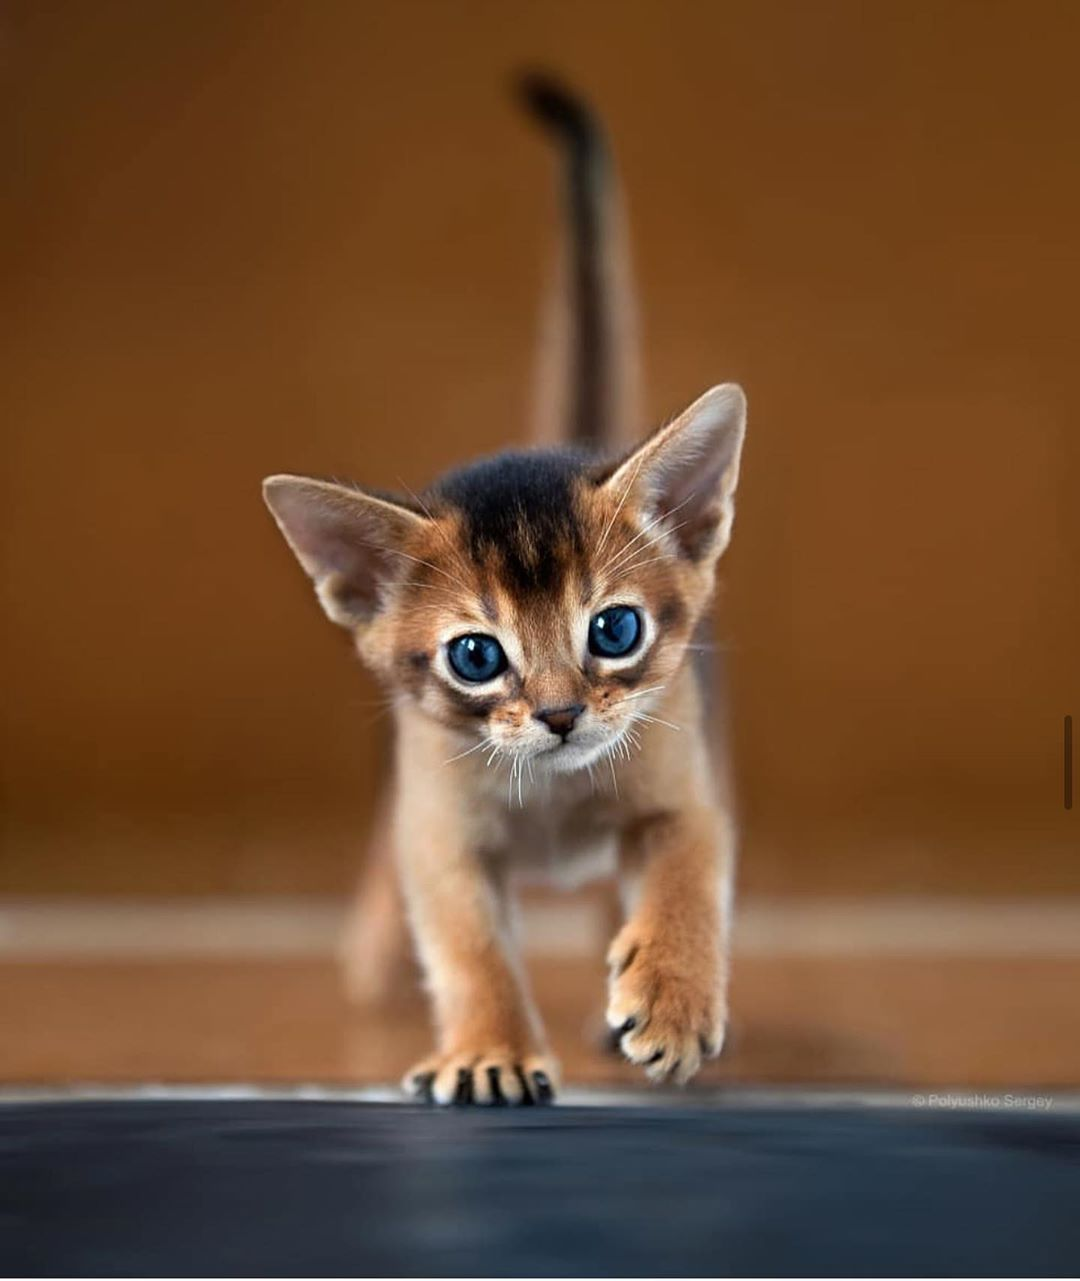 803 Likes 4 Comments Gorgeous Insta Shots Photographerswishes On Instagram Mekong Bobtail Kitten Kitt In 2020 Abyssinian Kittens Animals Cute Animals